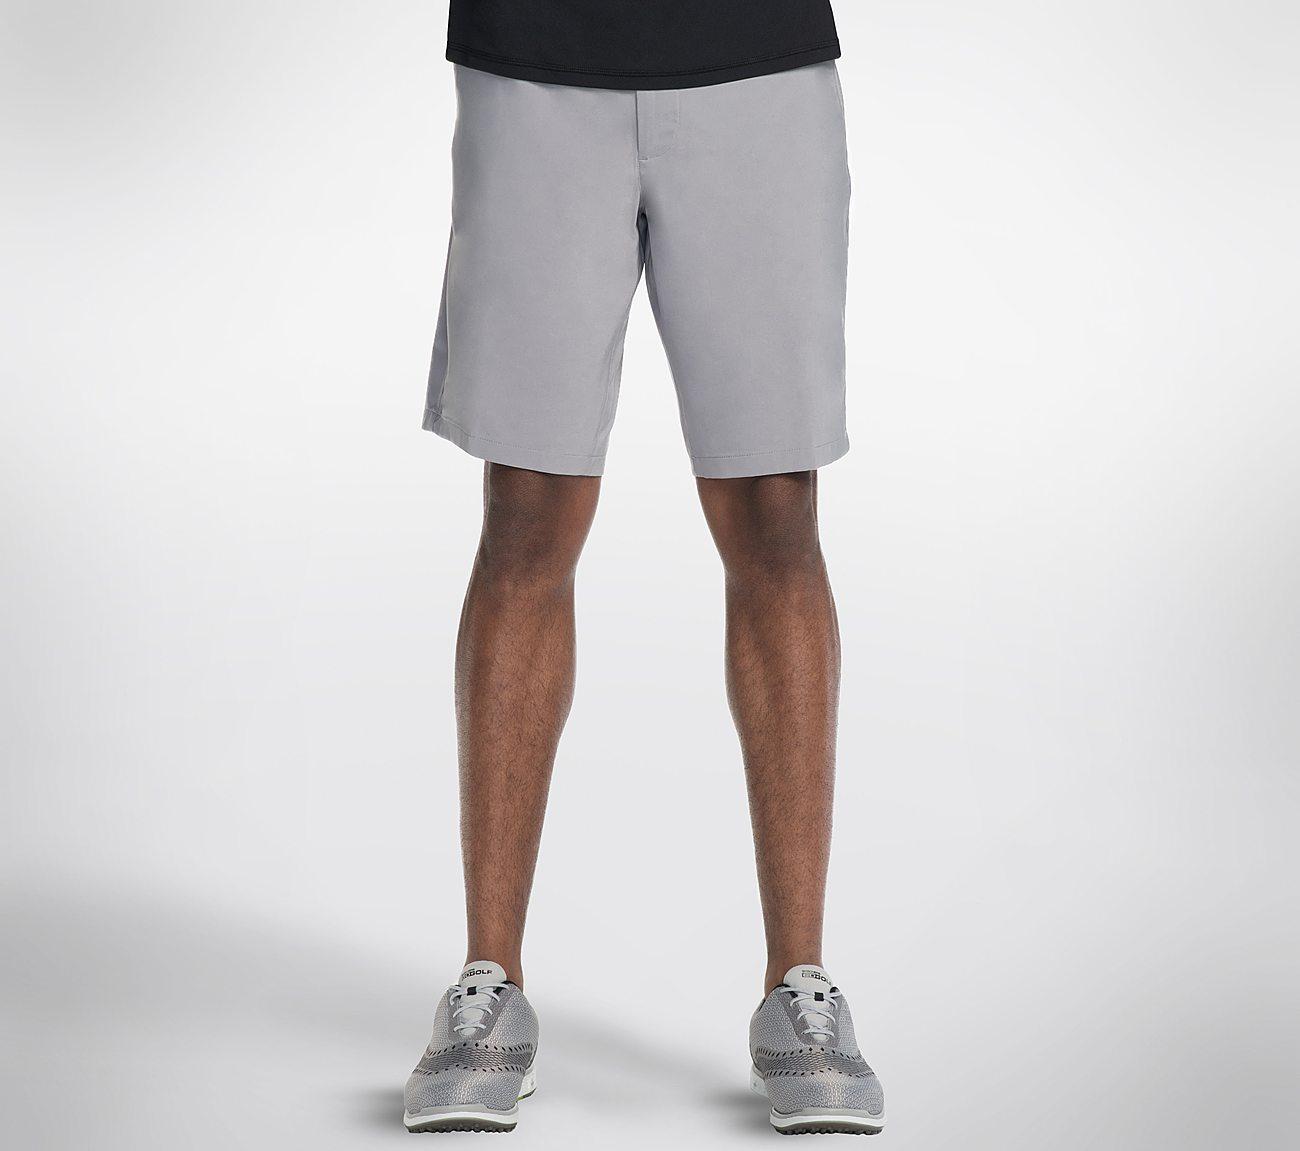 Skechers Men's Eagle On 10 Shorts